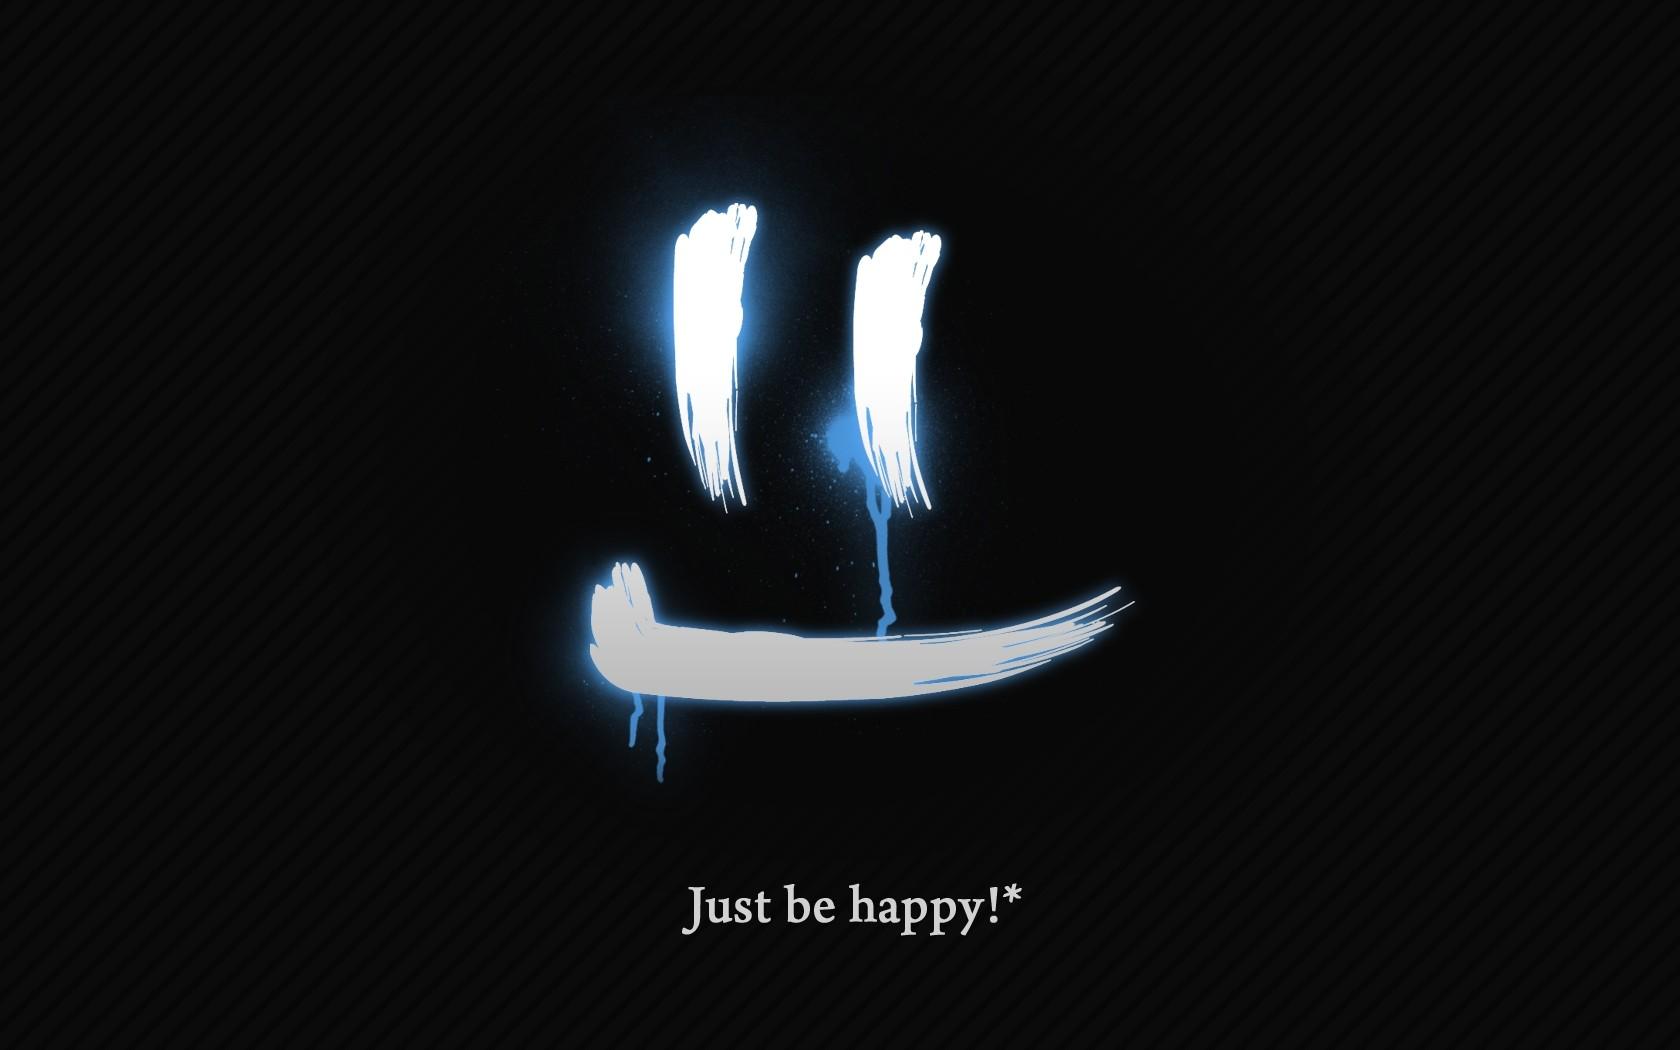 illustration text logo motivational circle brand happy face symbol computer wallpaper font